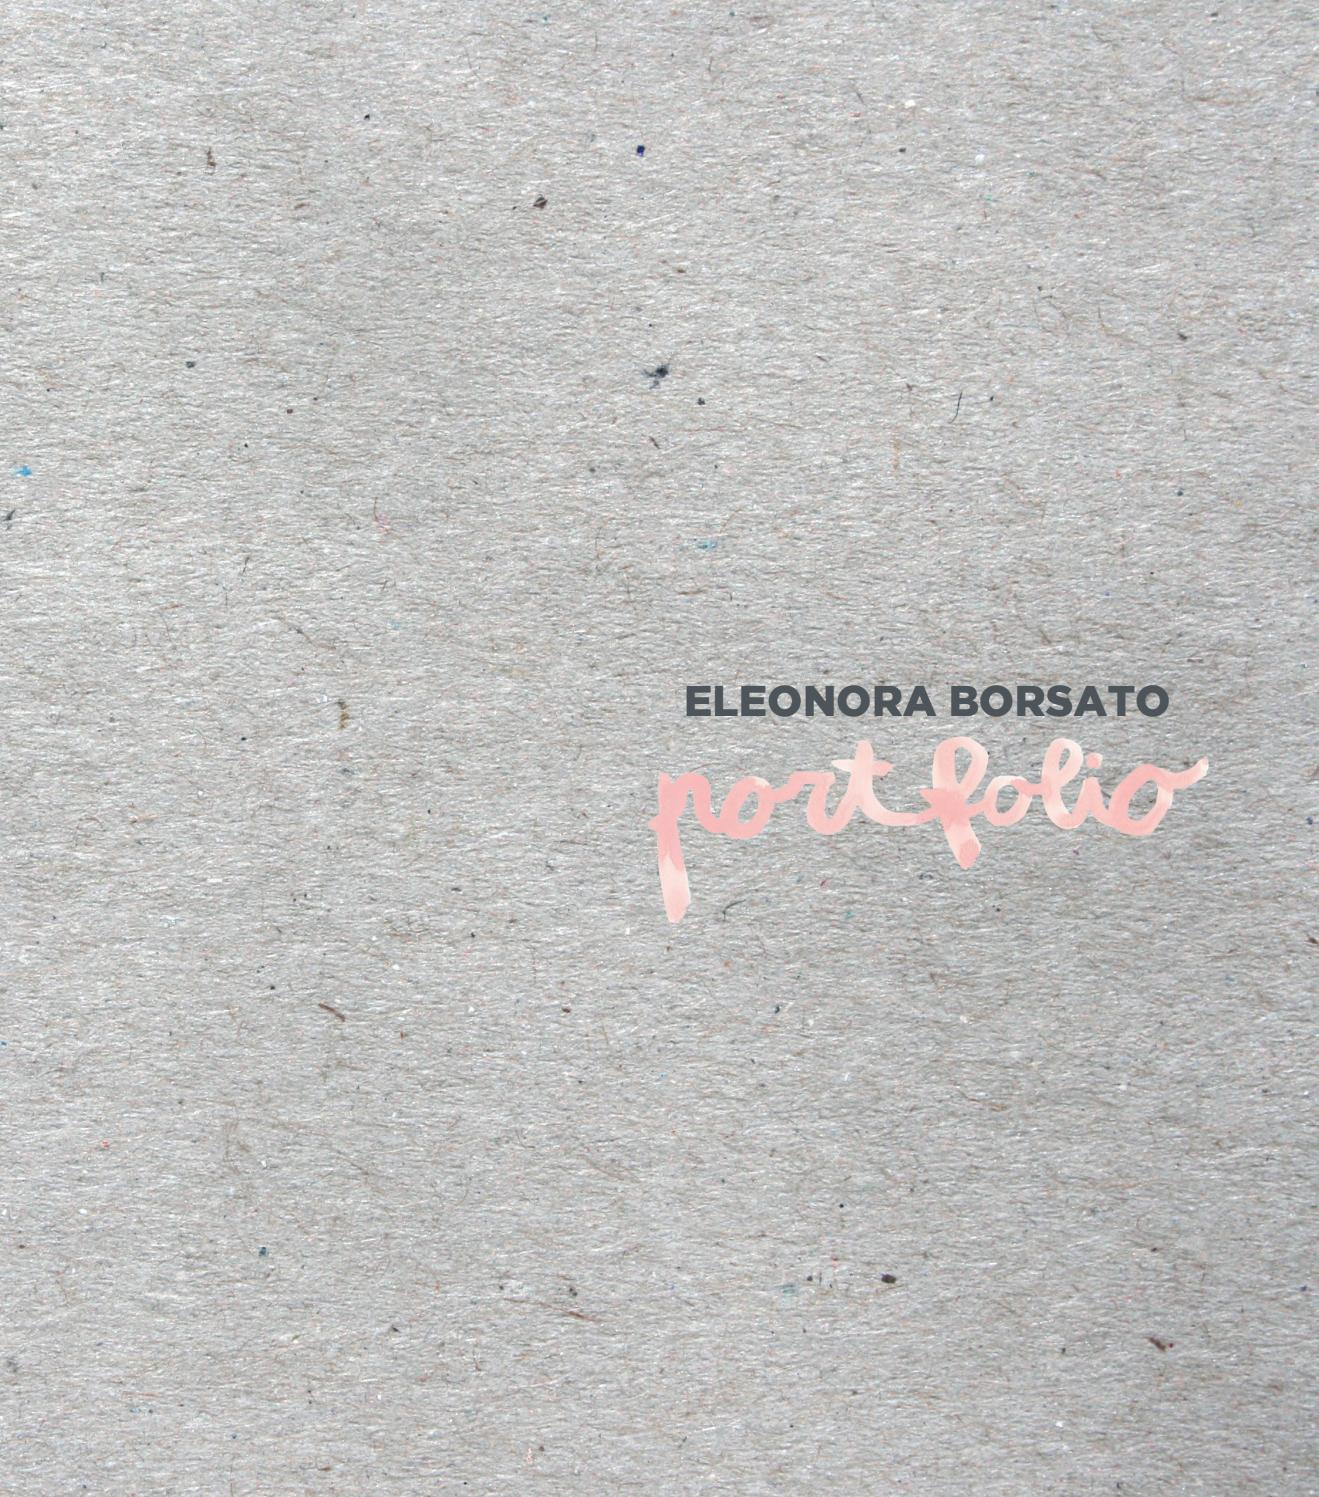 Fashion Design Portfolio Eleonora Borsato By Eleonora Borsato Issuu